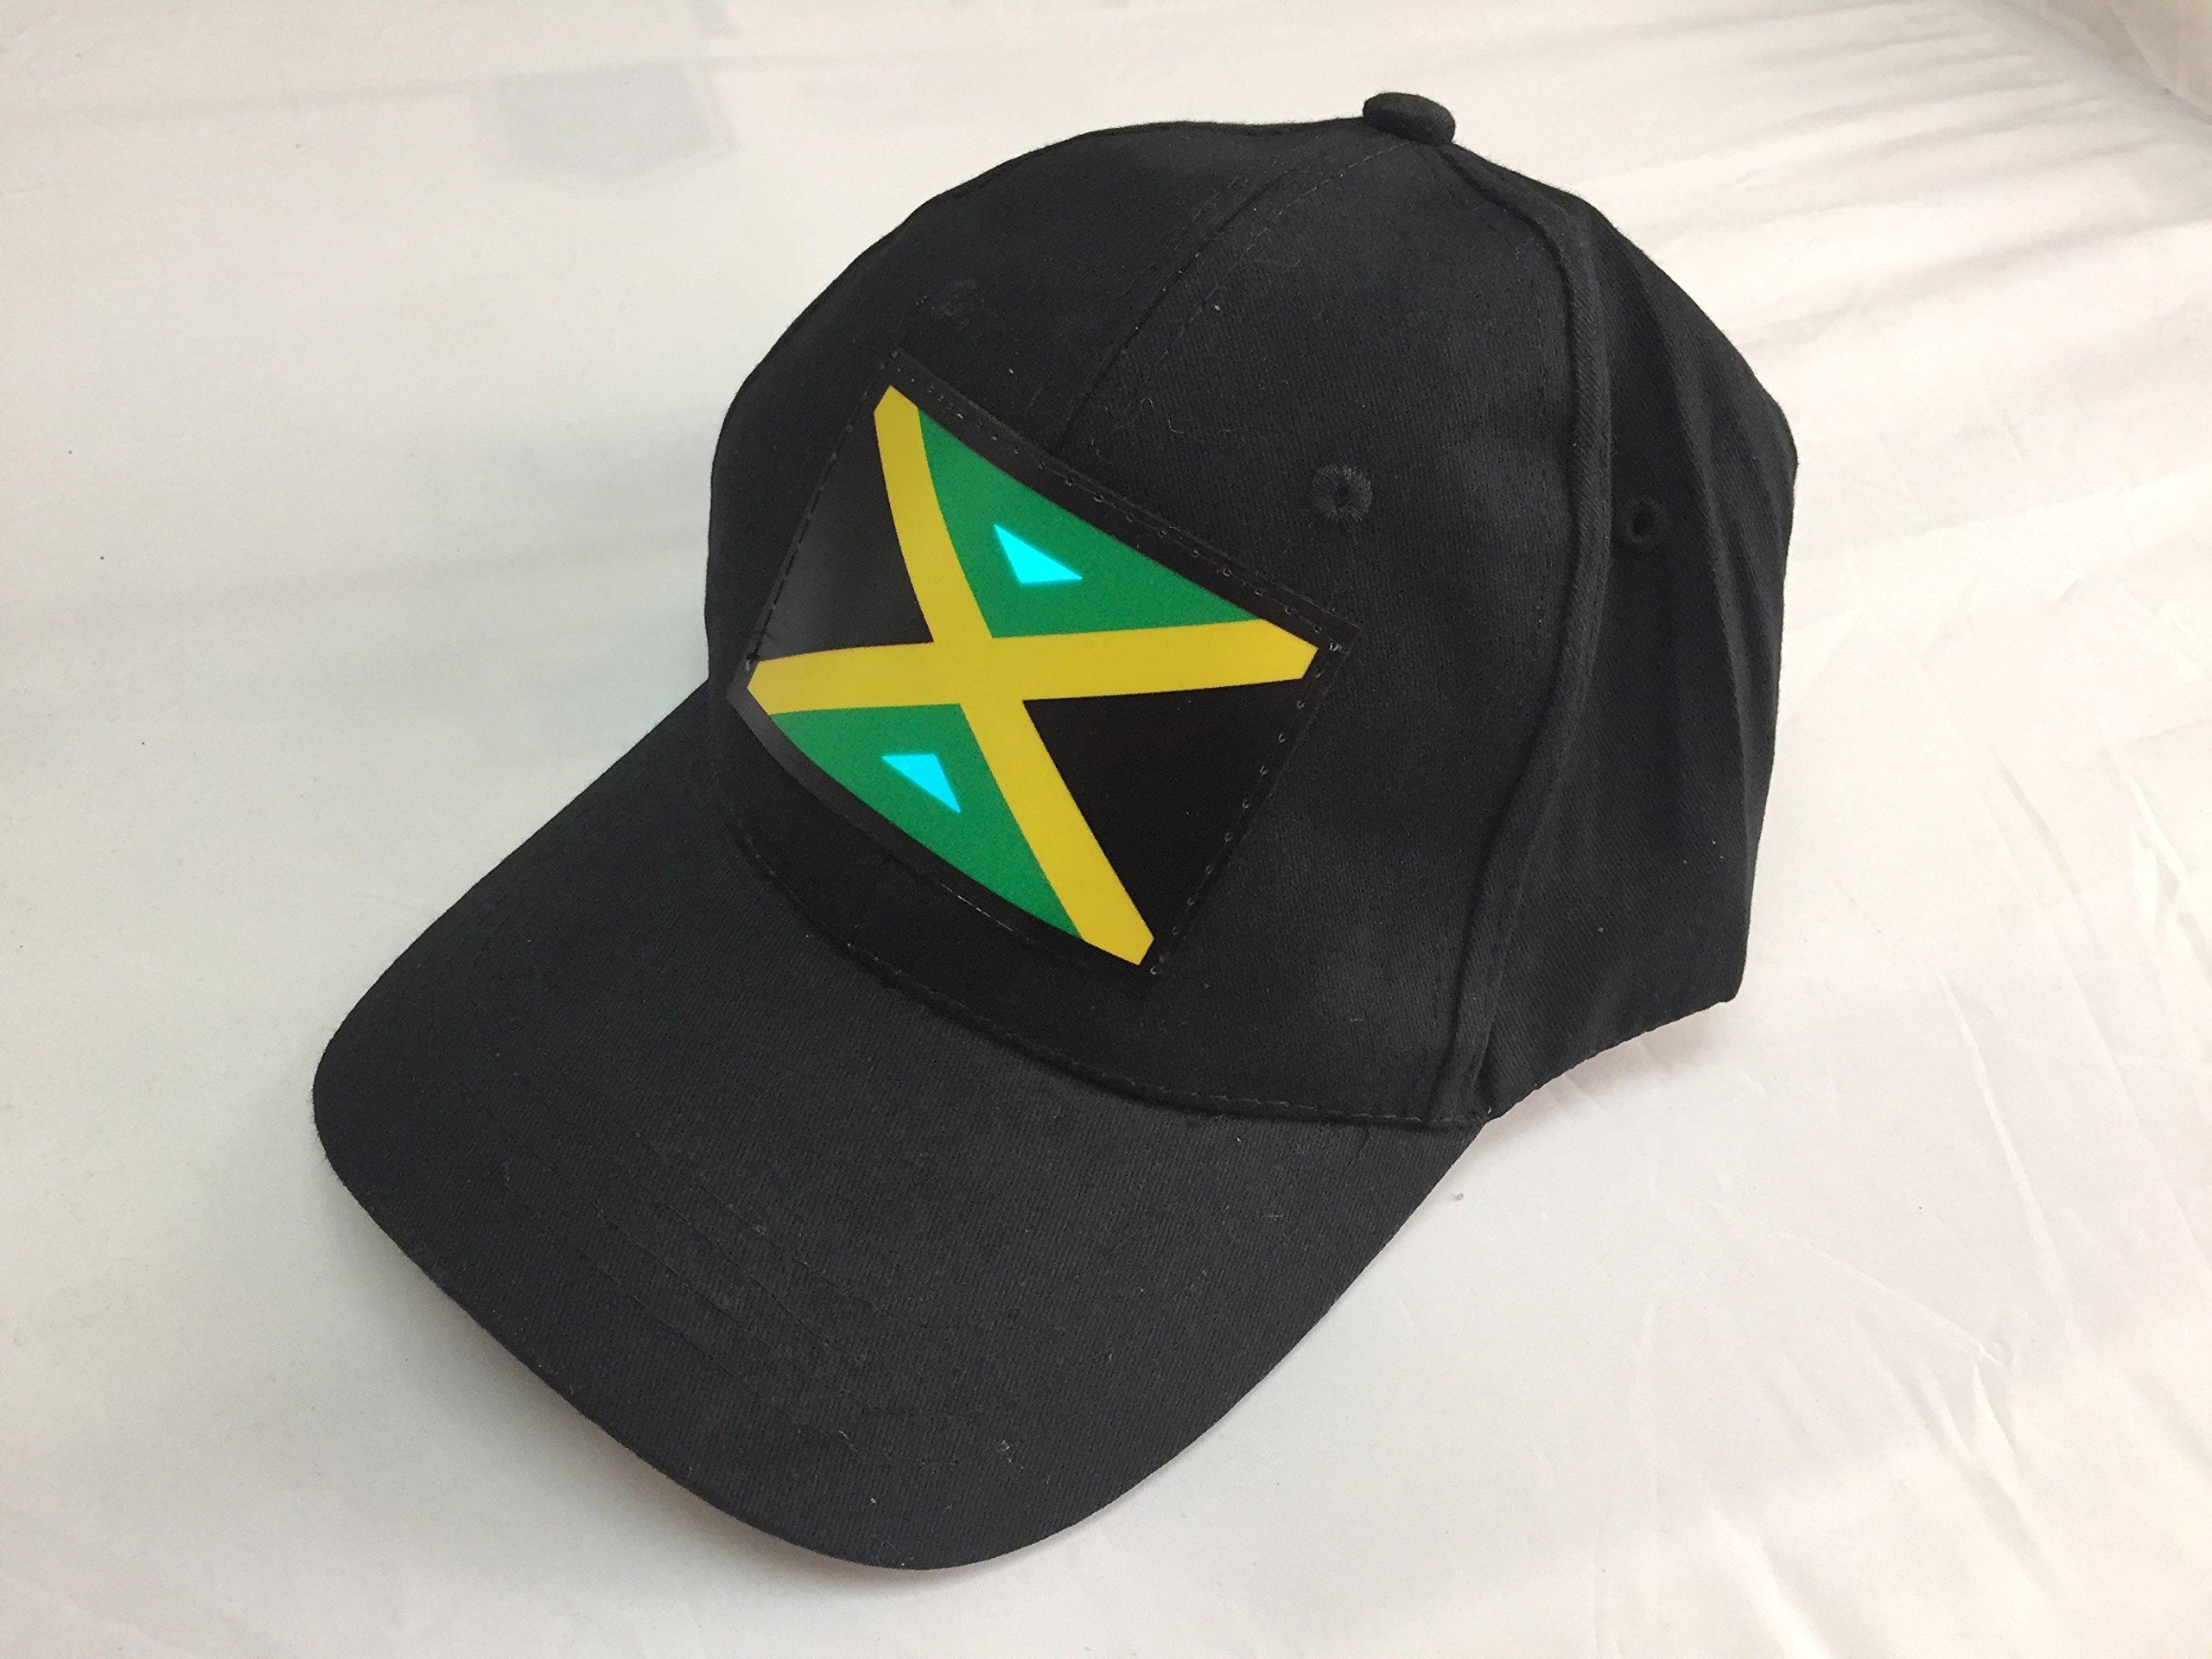 Accessory 4u Inc Dj Led Light Flashing Sound Activated Jamaica Jamaican Flag Light up Disco Rave Party Dj Dance Dancing Hat Cap